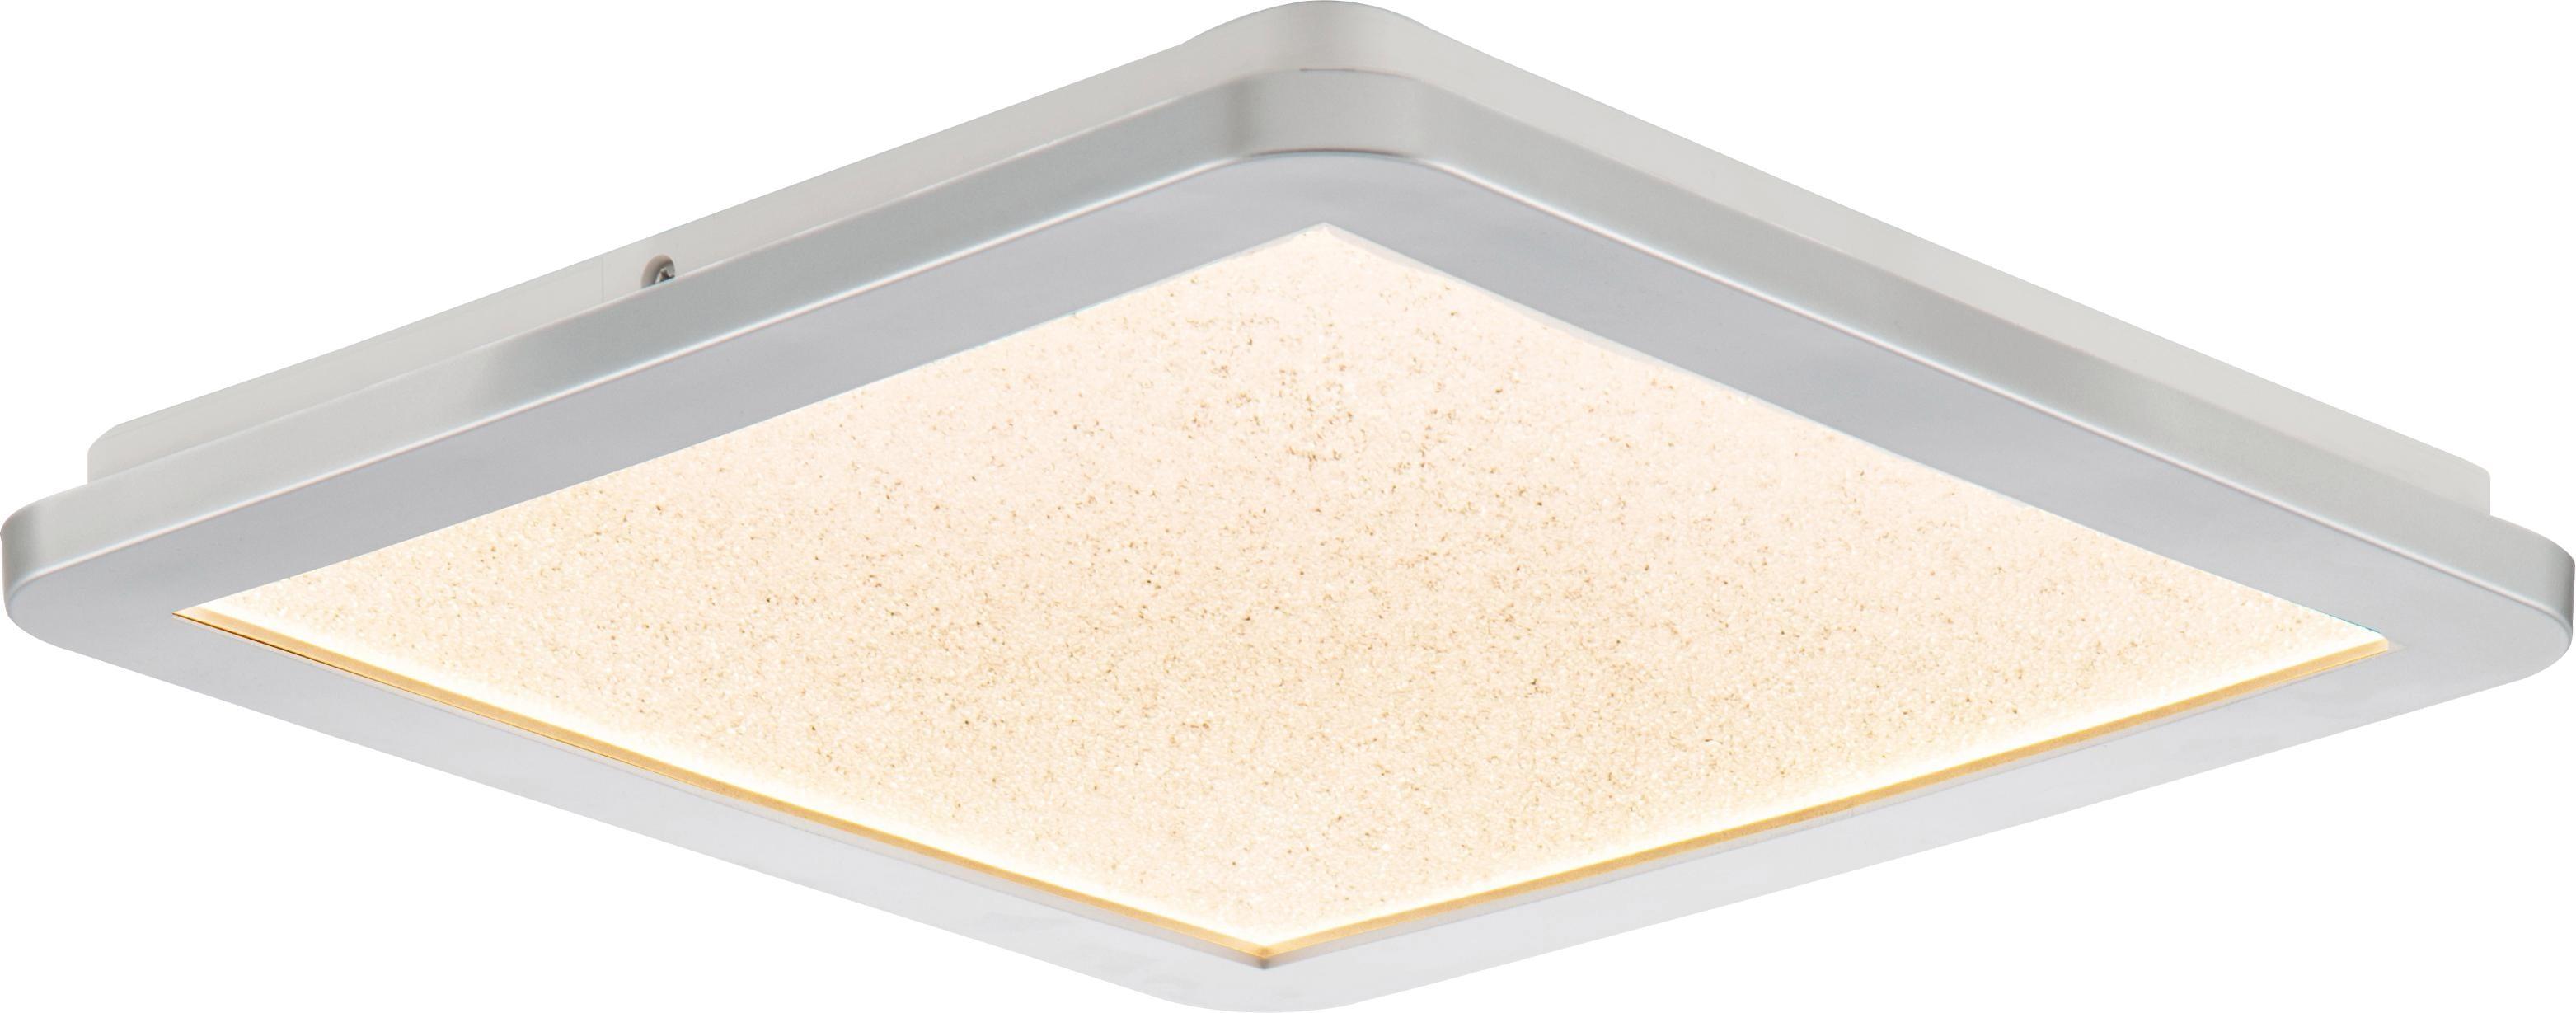 Nino Leuchten LED Deckenleuchte IKOMA